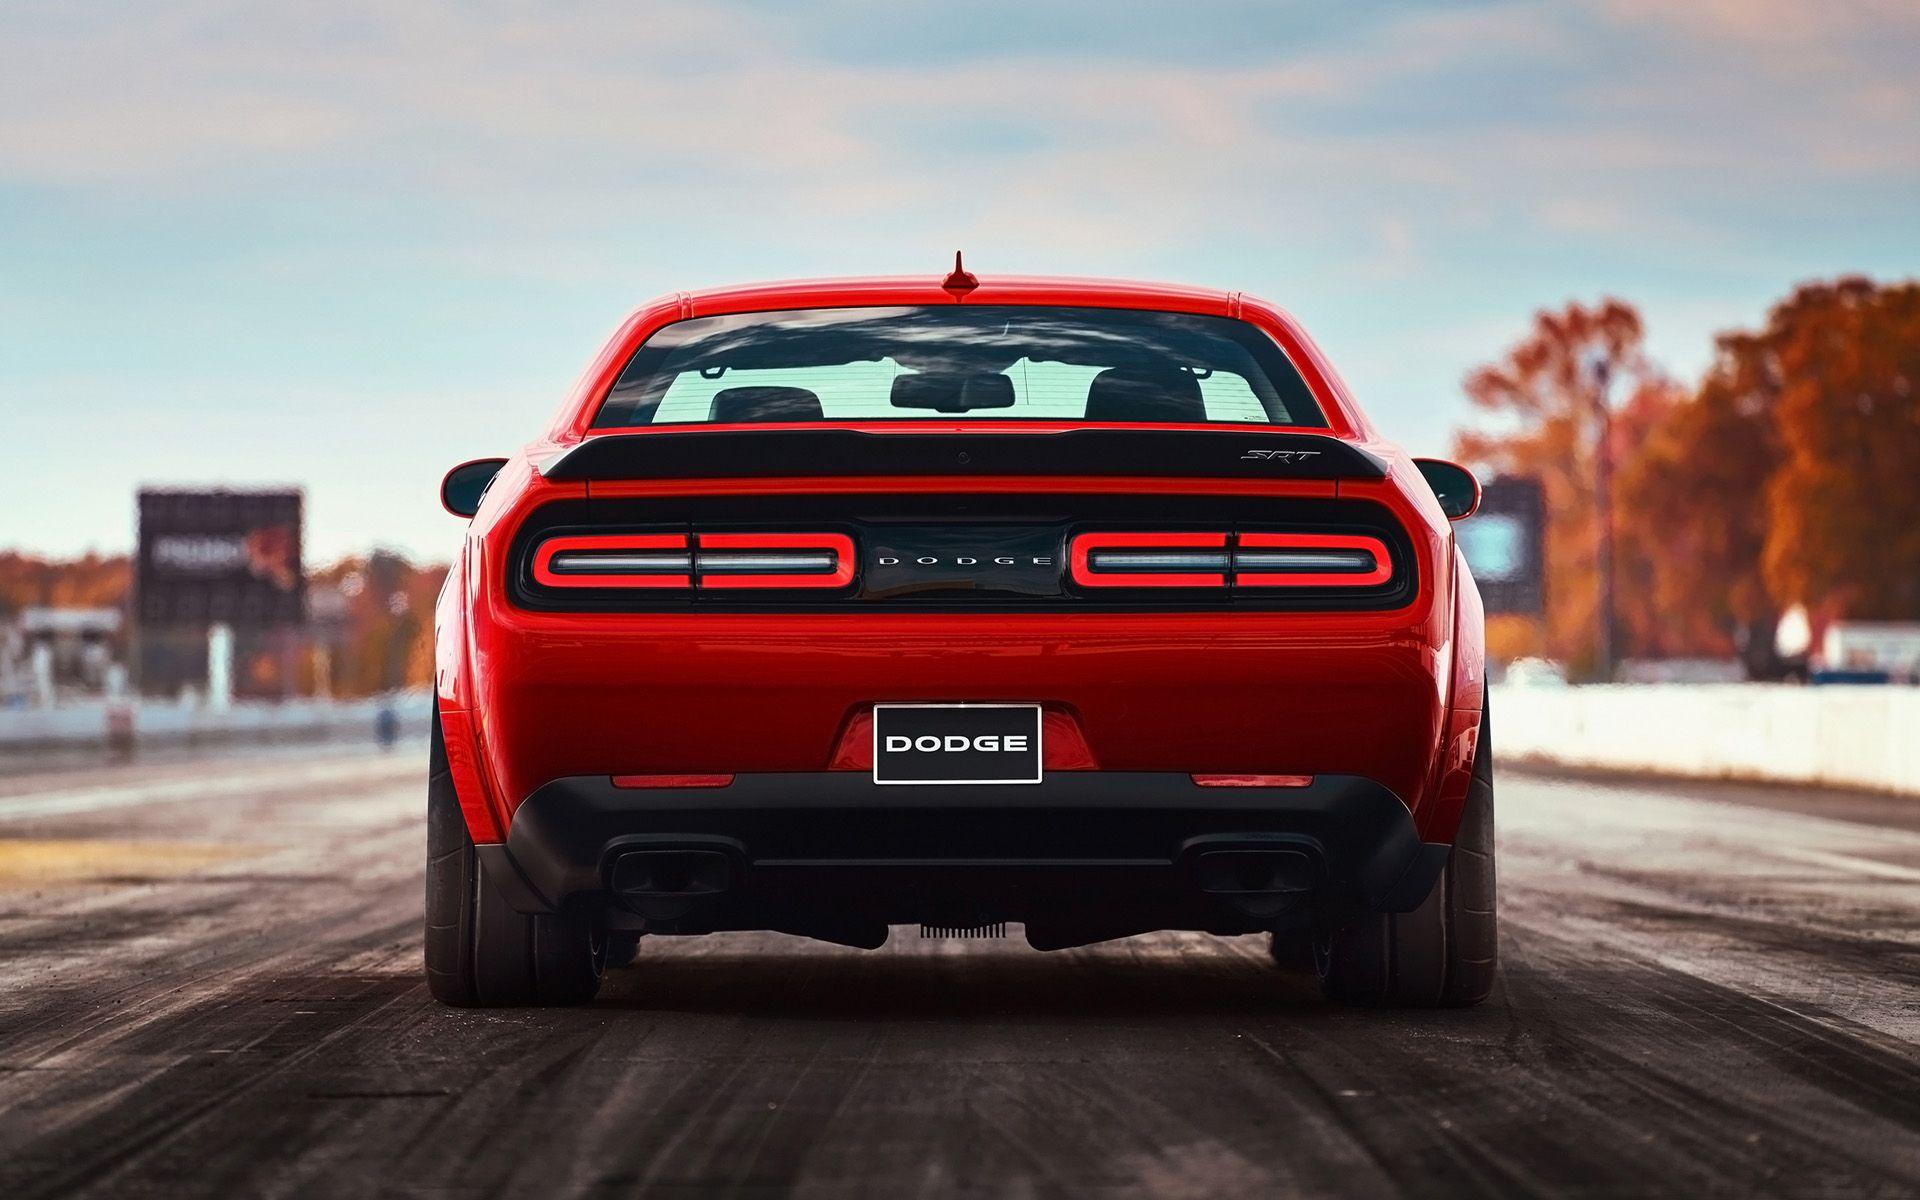 2018 Dodge Challenger Srt Demon Serious Wheels Auto Poster Dodge Demon Poster